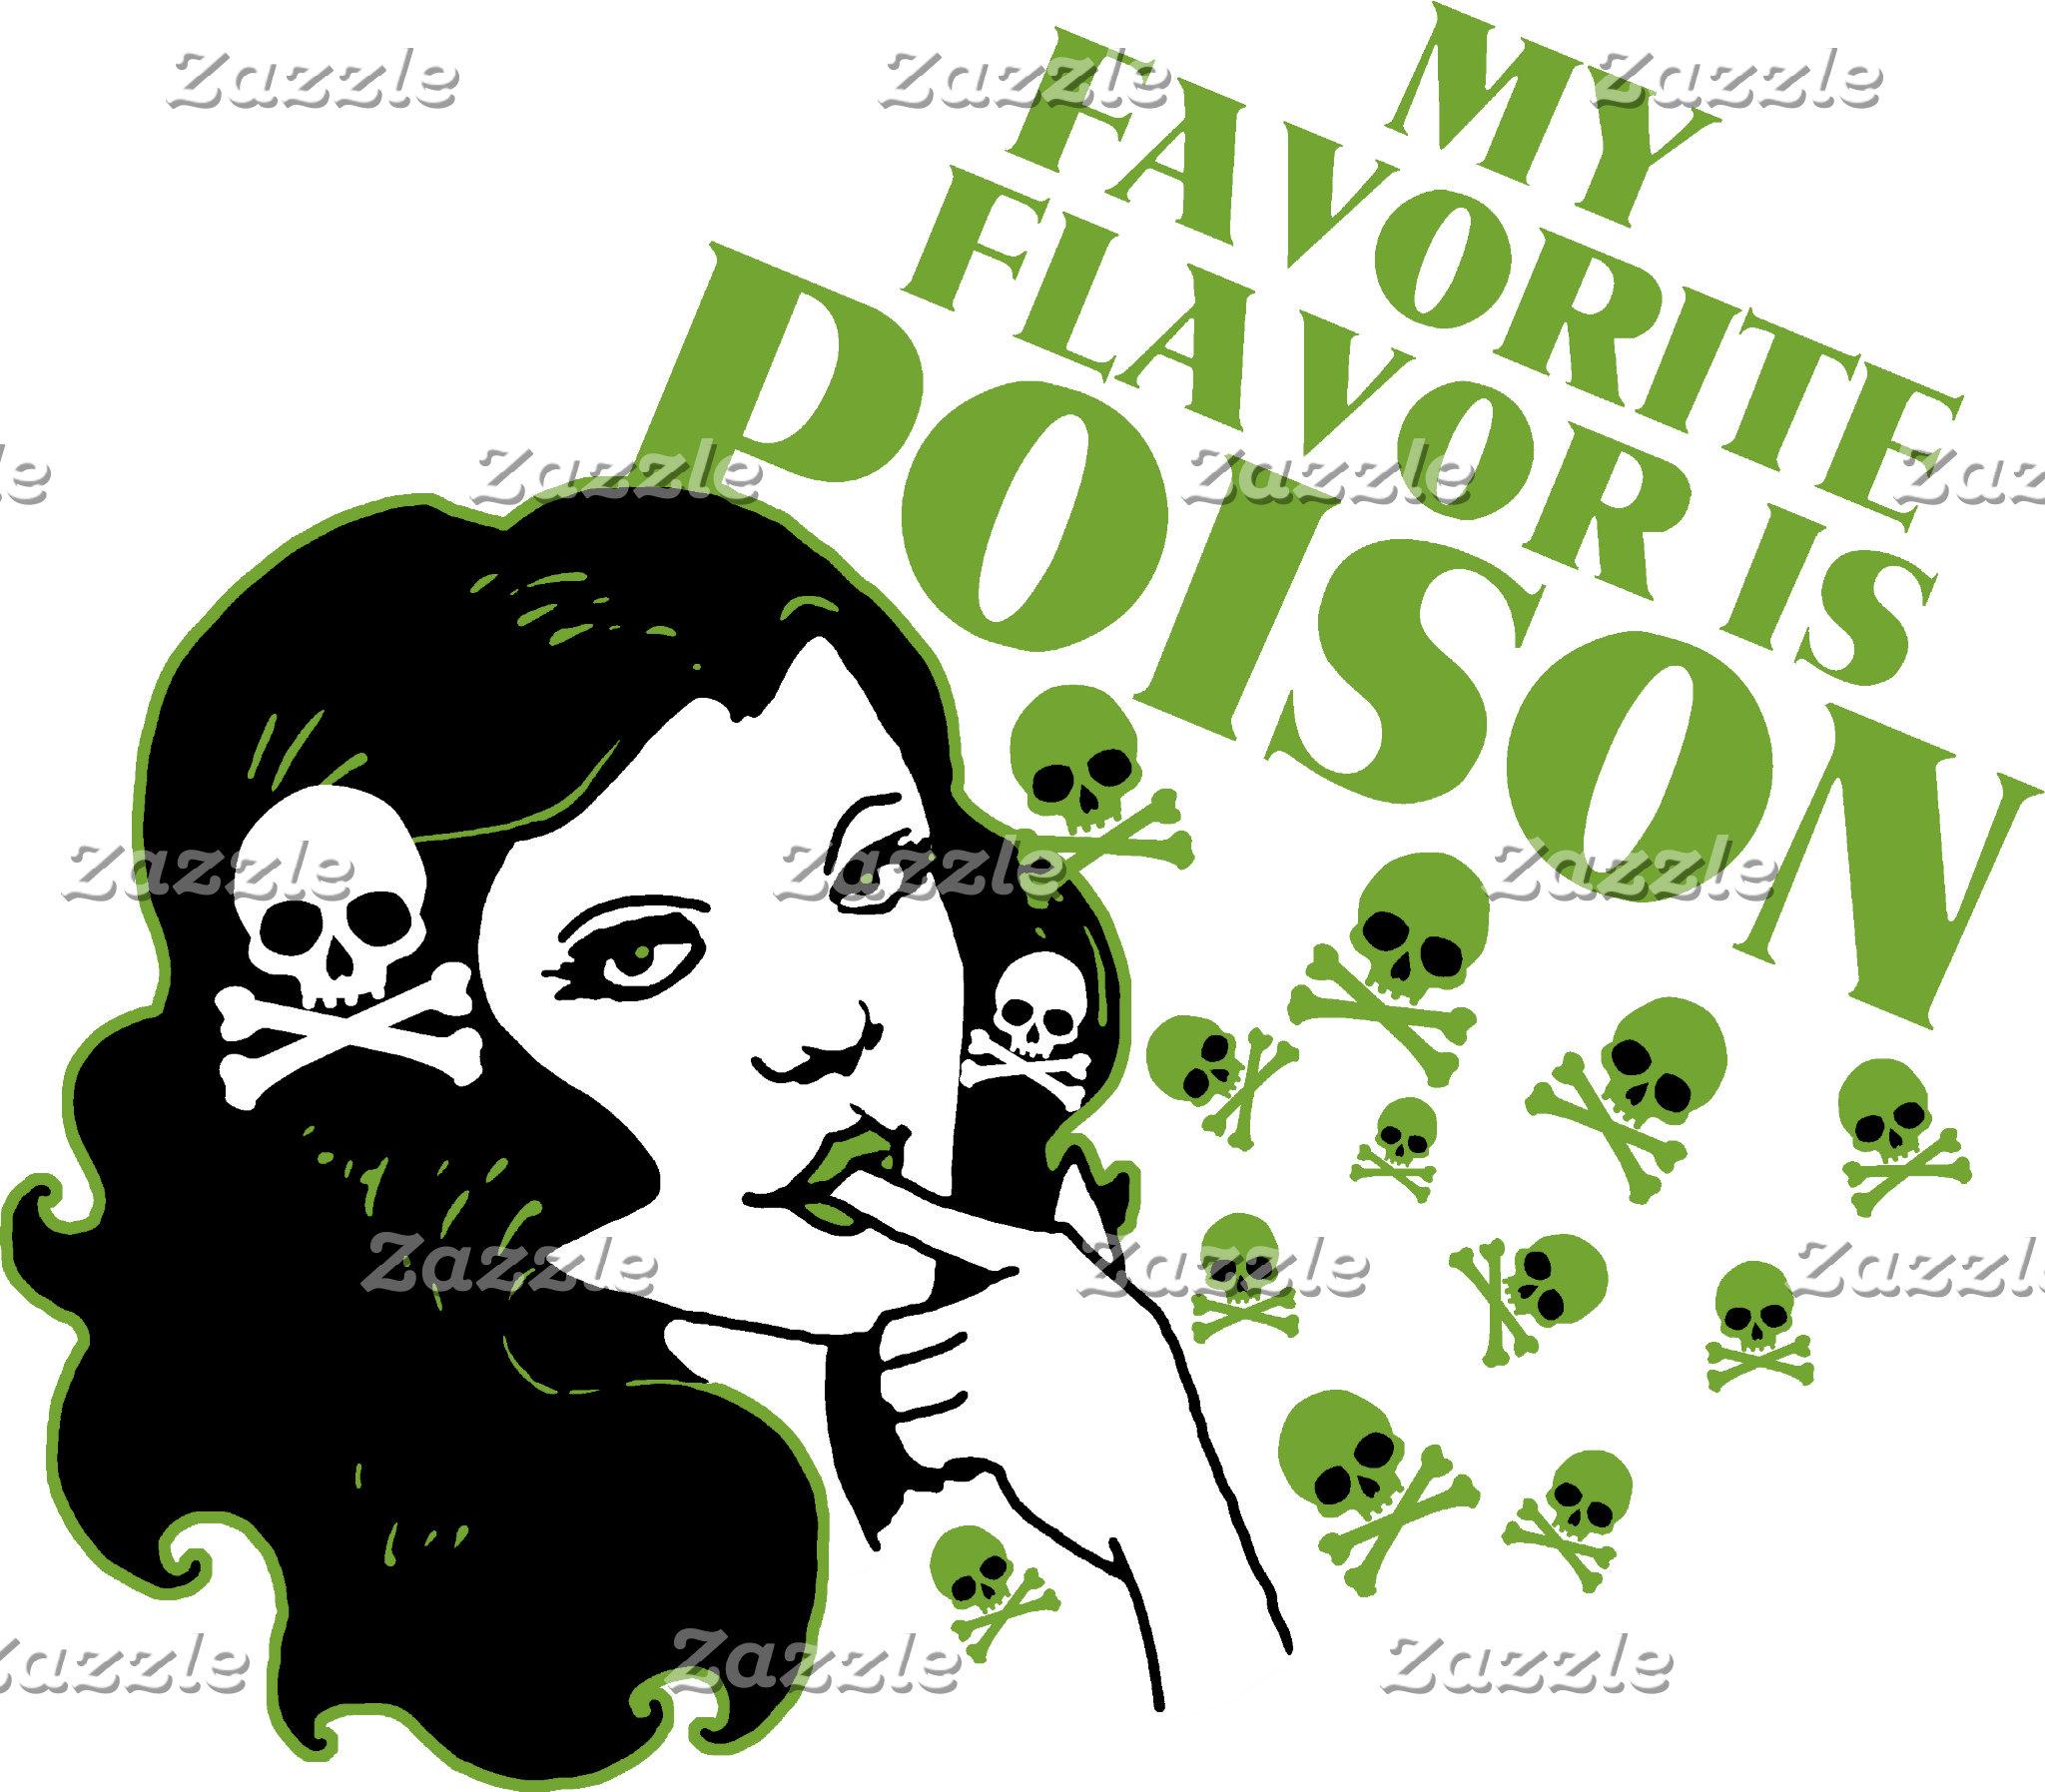 My Favorite Flavor is Poison